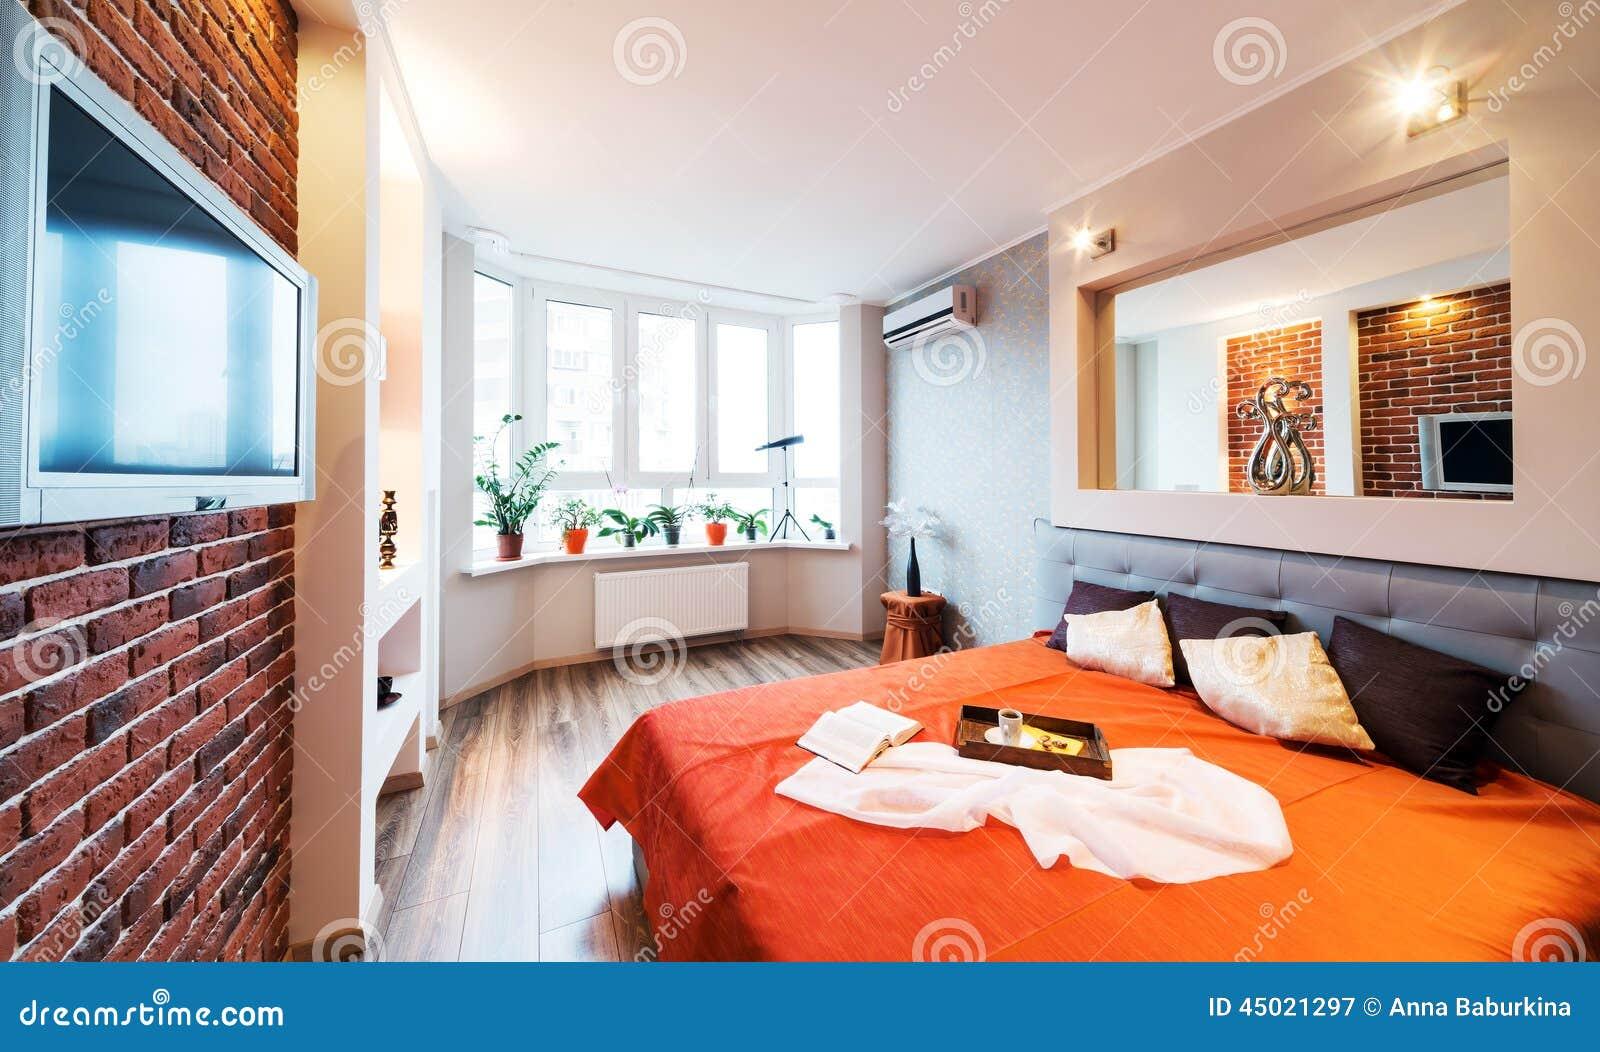 Master Bedroom Stock Photo Image 45021297